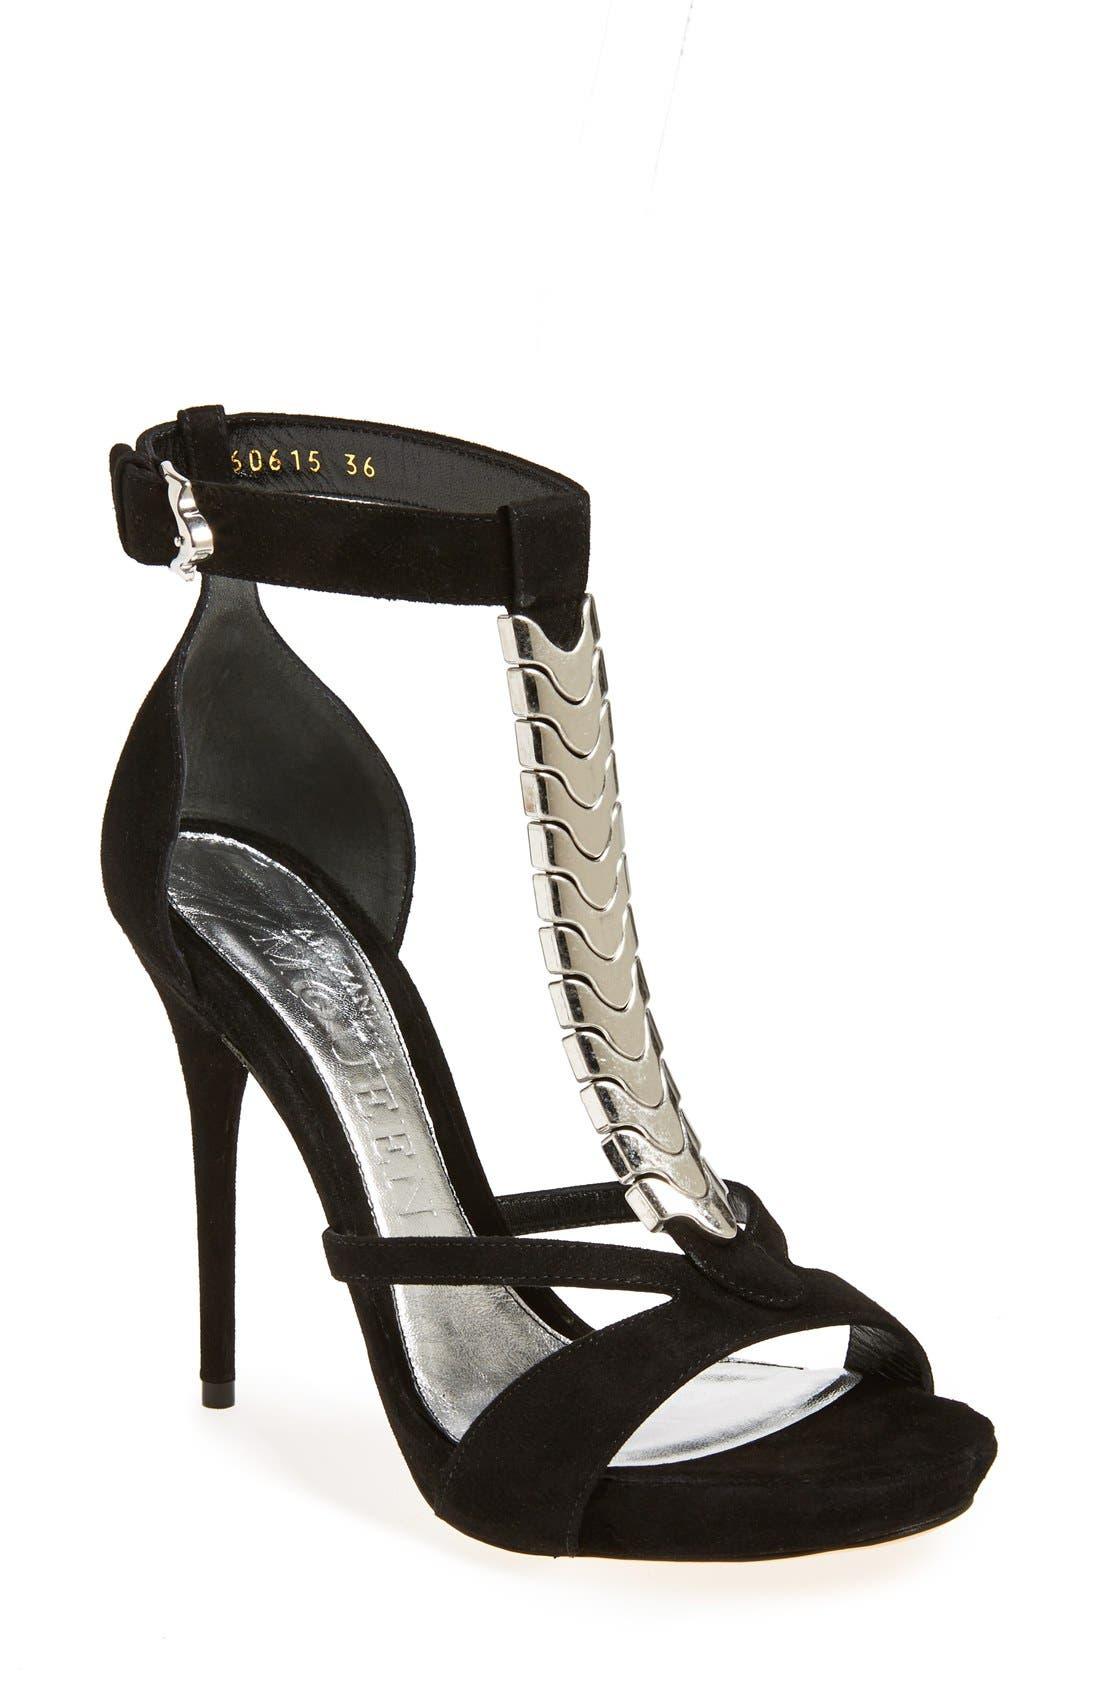 Alternate Image 1 Selected - Alexander McQueen T-Strap Sandal (Women)